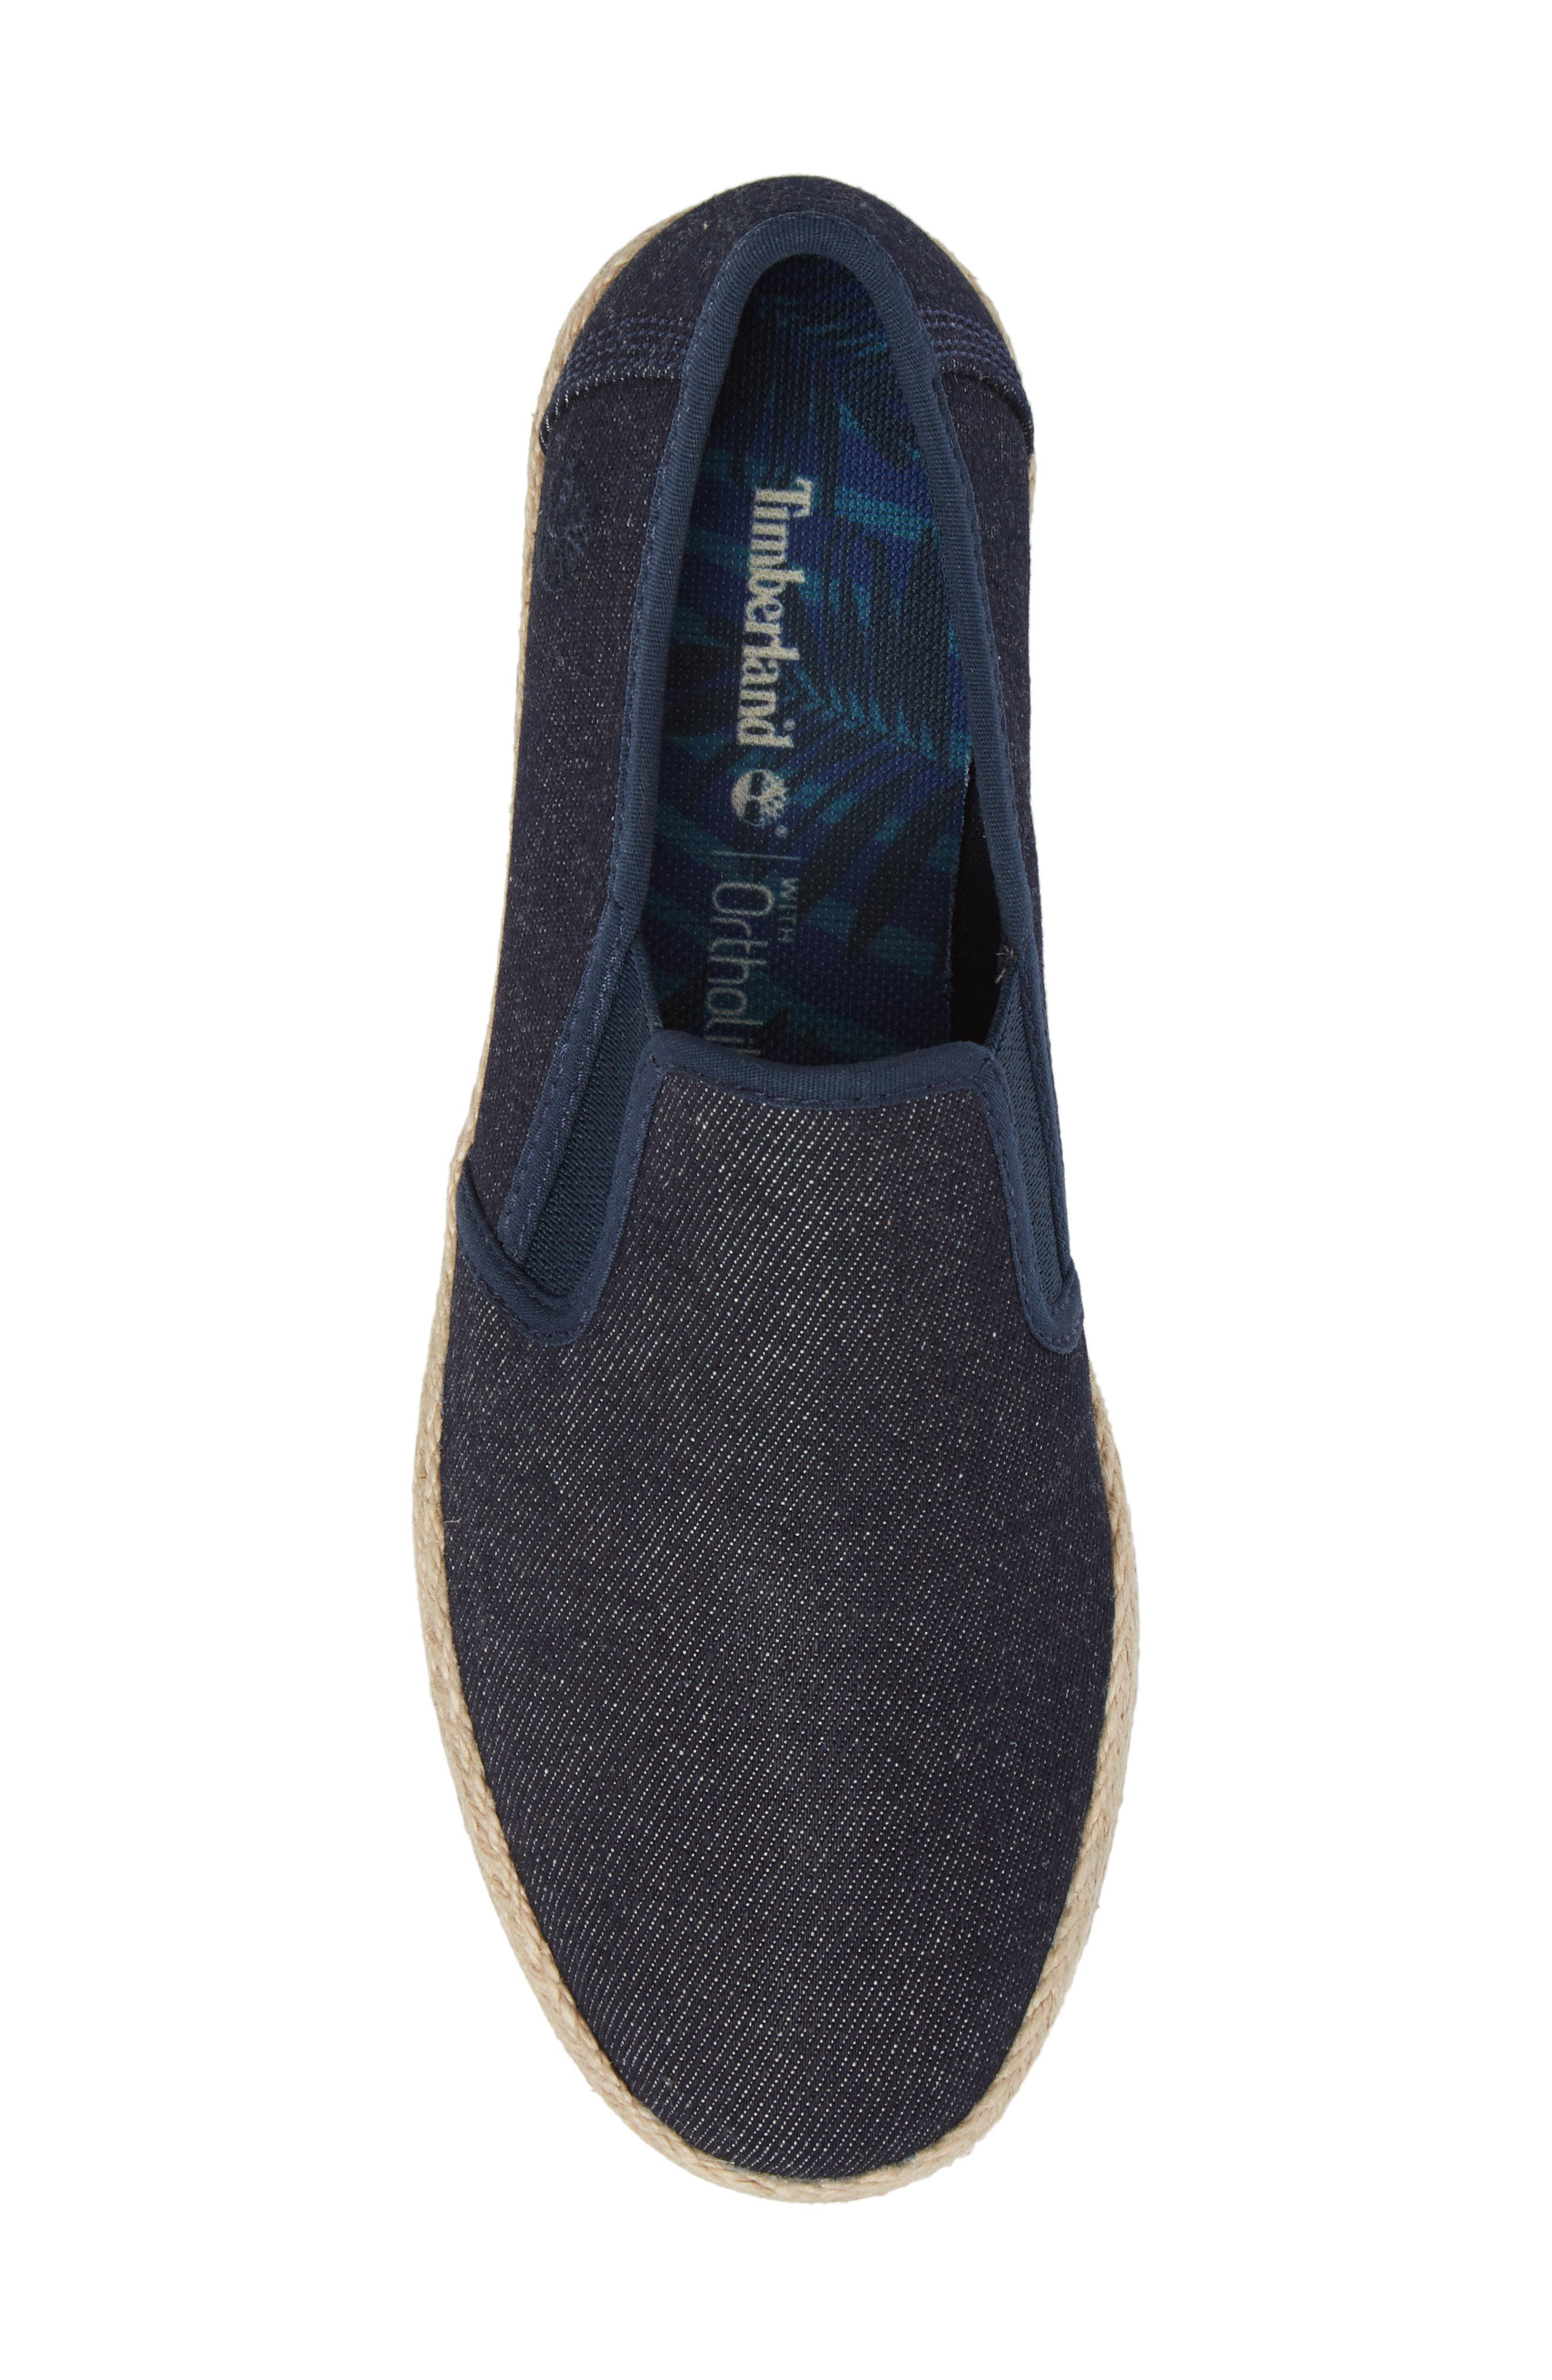 Eivissa Sea Slip-On Sneaker,                             Alternate thumbnail 5, color,                             Navy Canvas